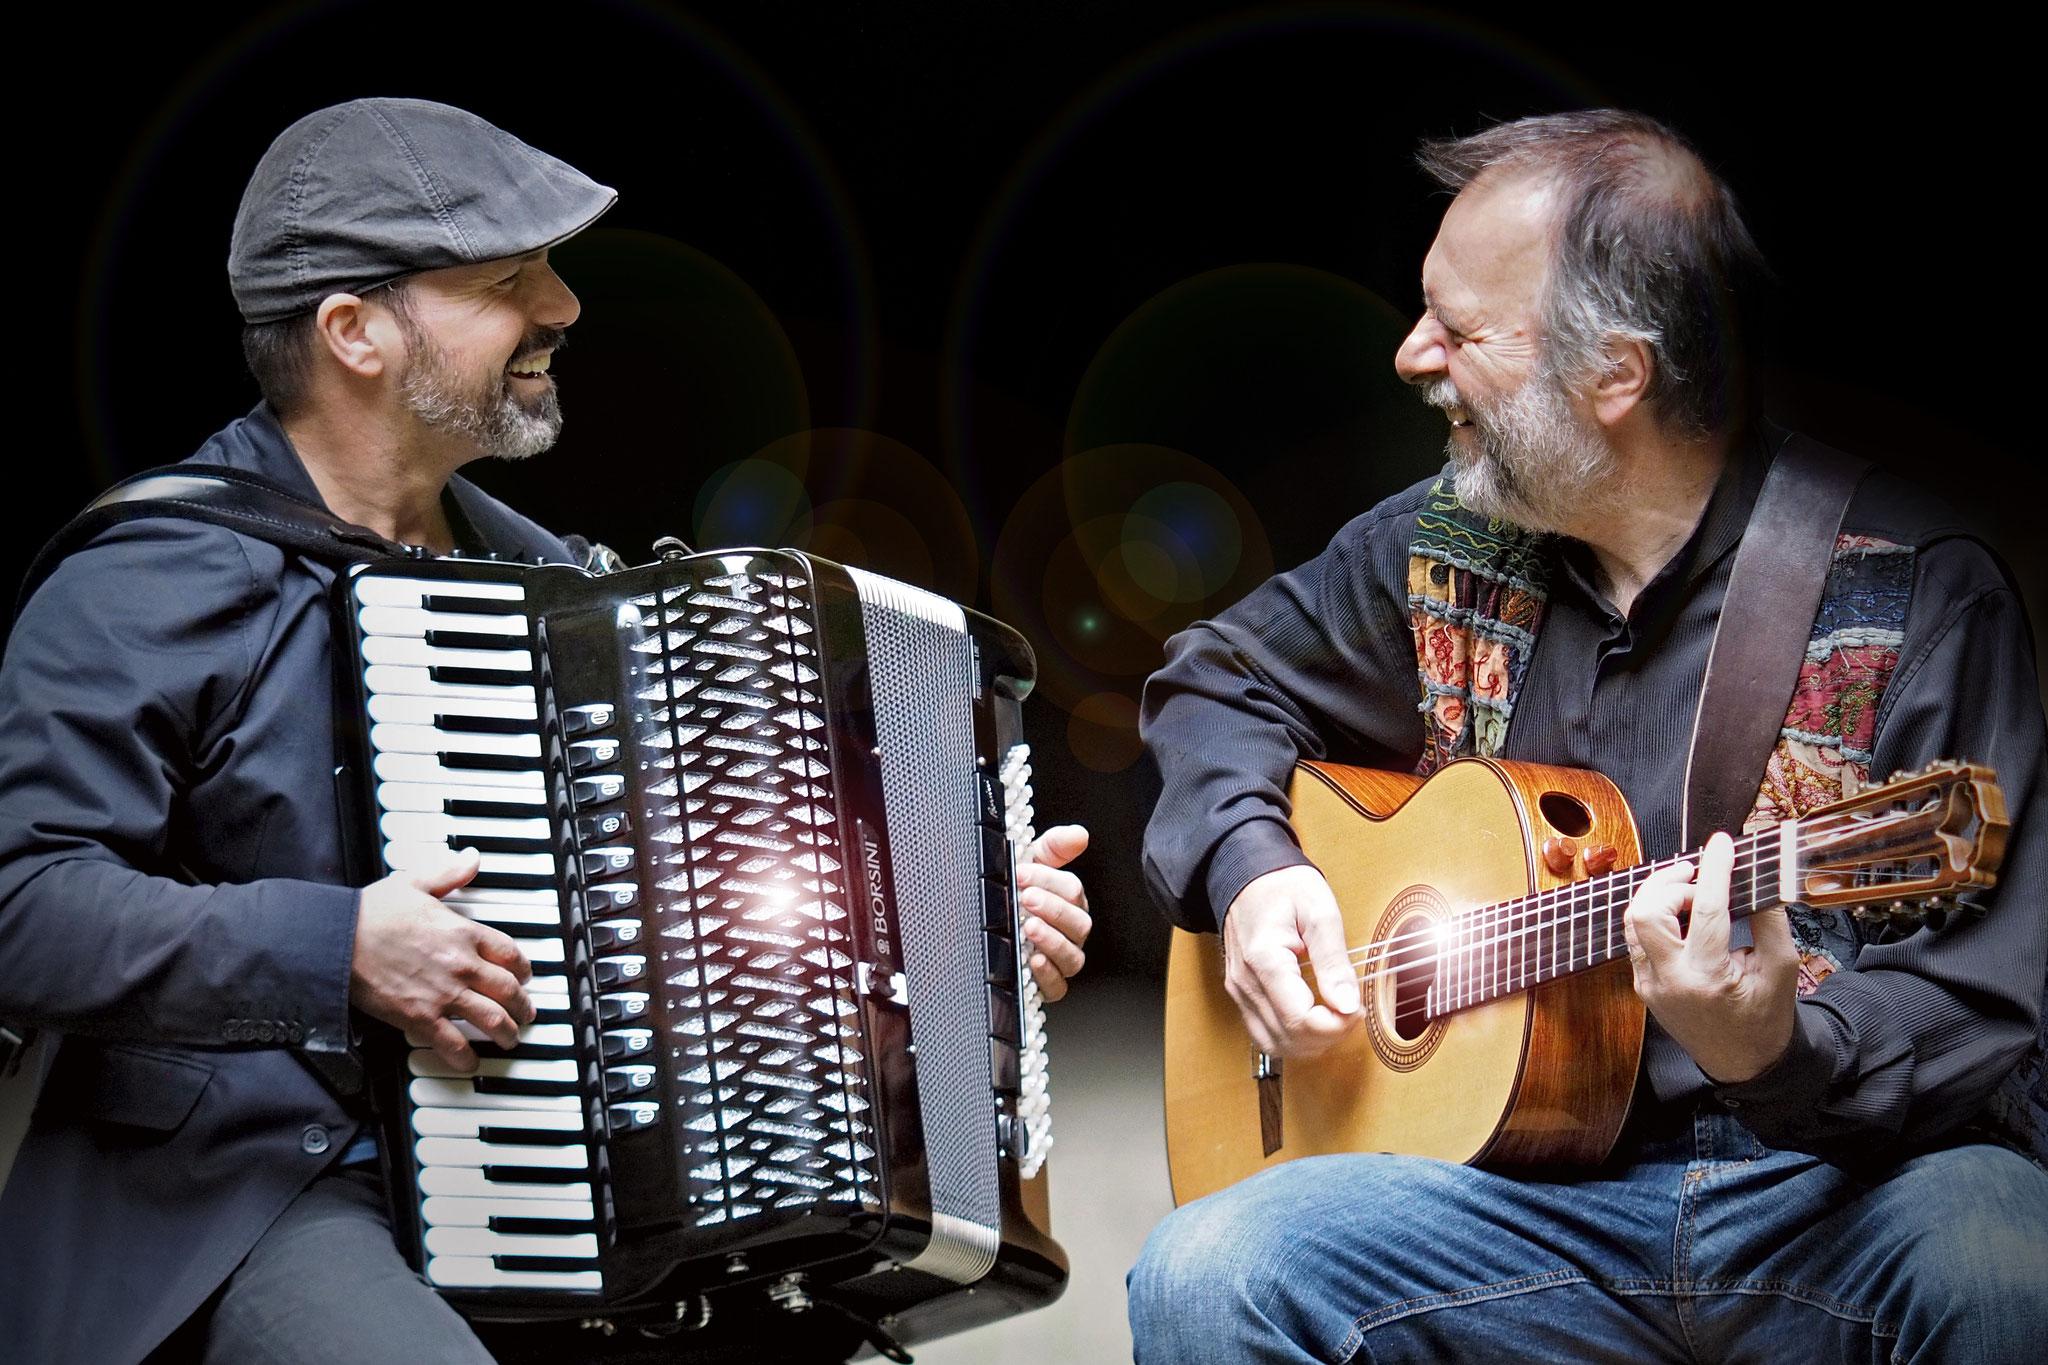 Michael Marx & Nino Deda; @T.Reinhardt